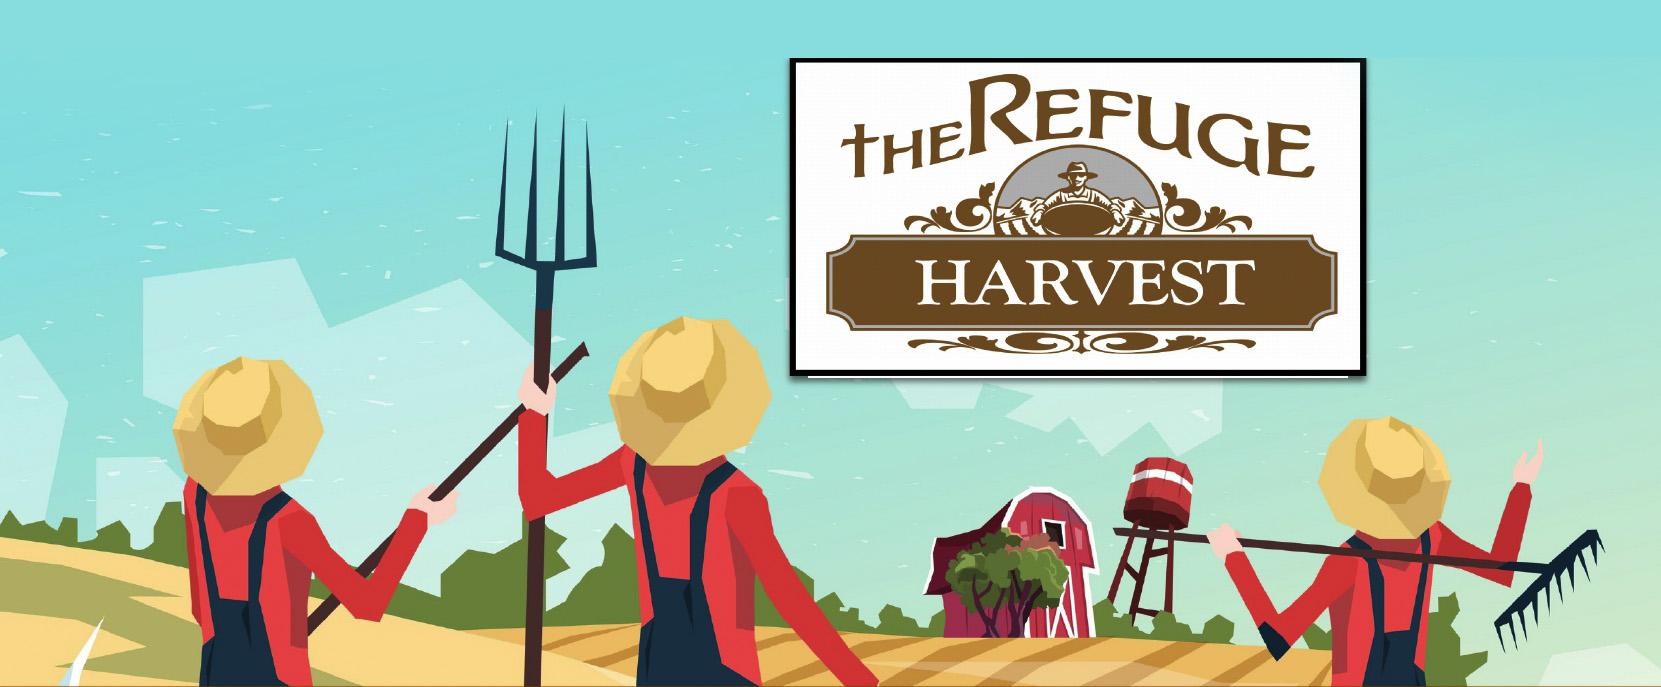 Harvest: A Community Family Festival